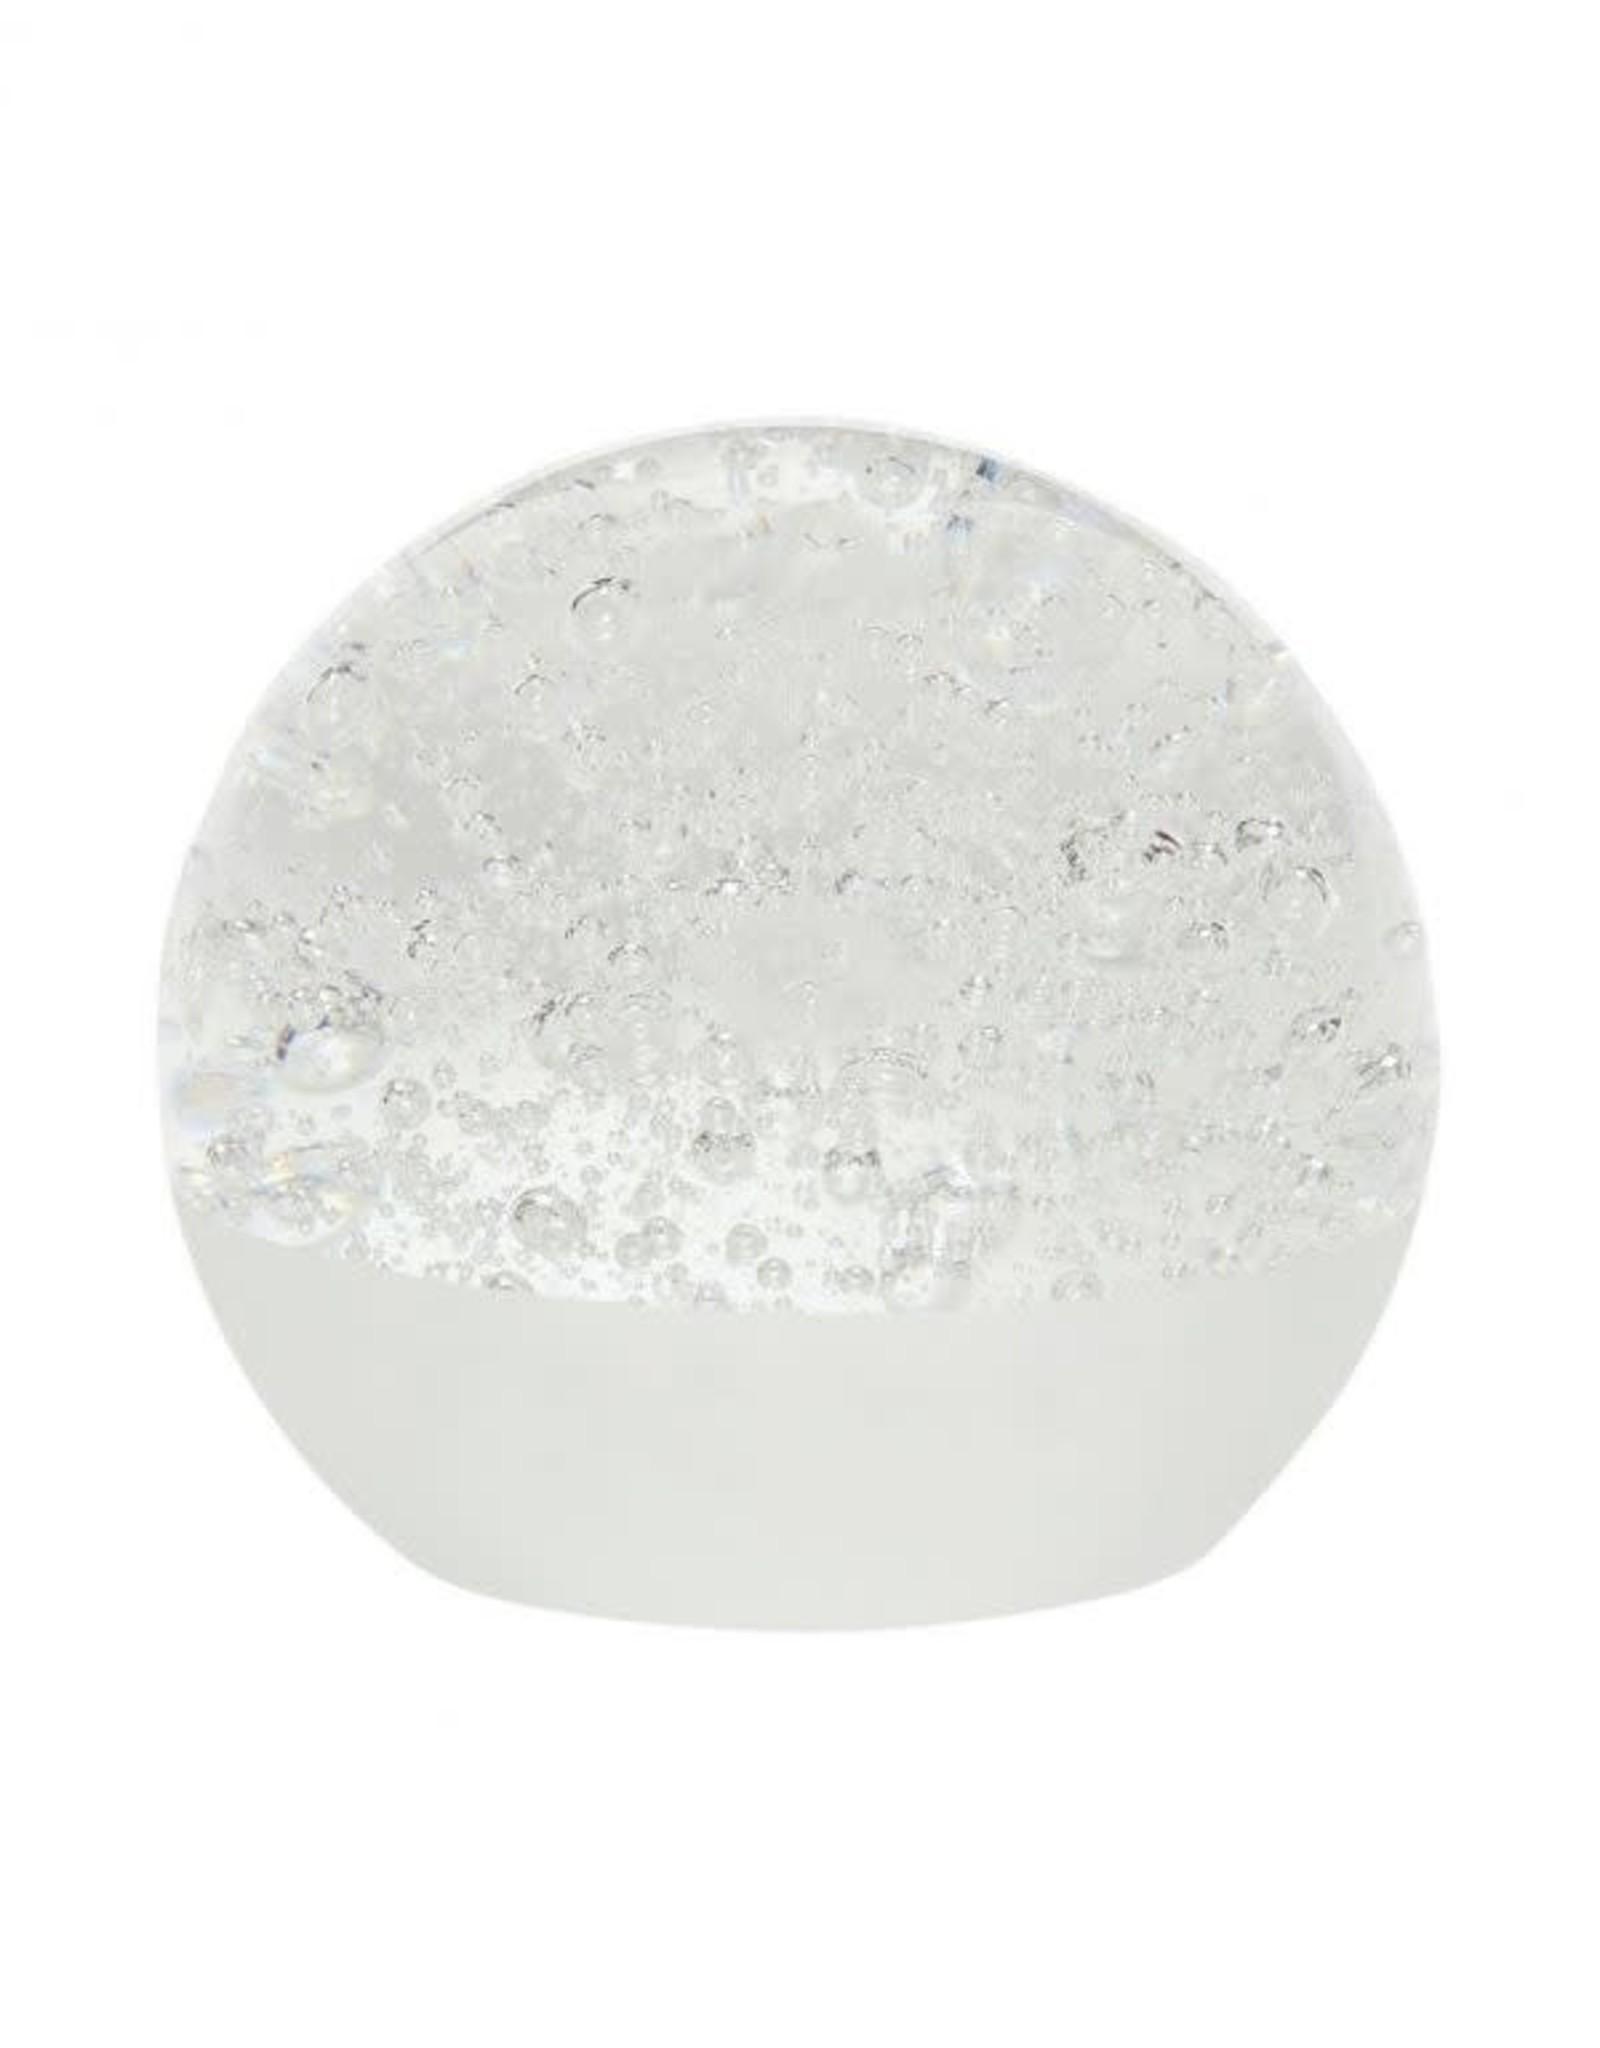 Hübsch Hübsch Paperweight Glass White 9cm